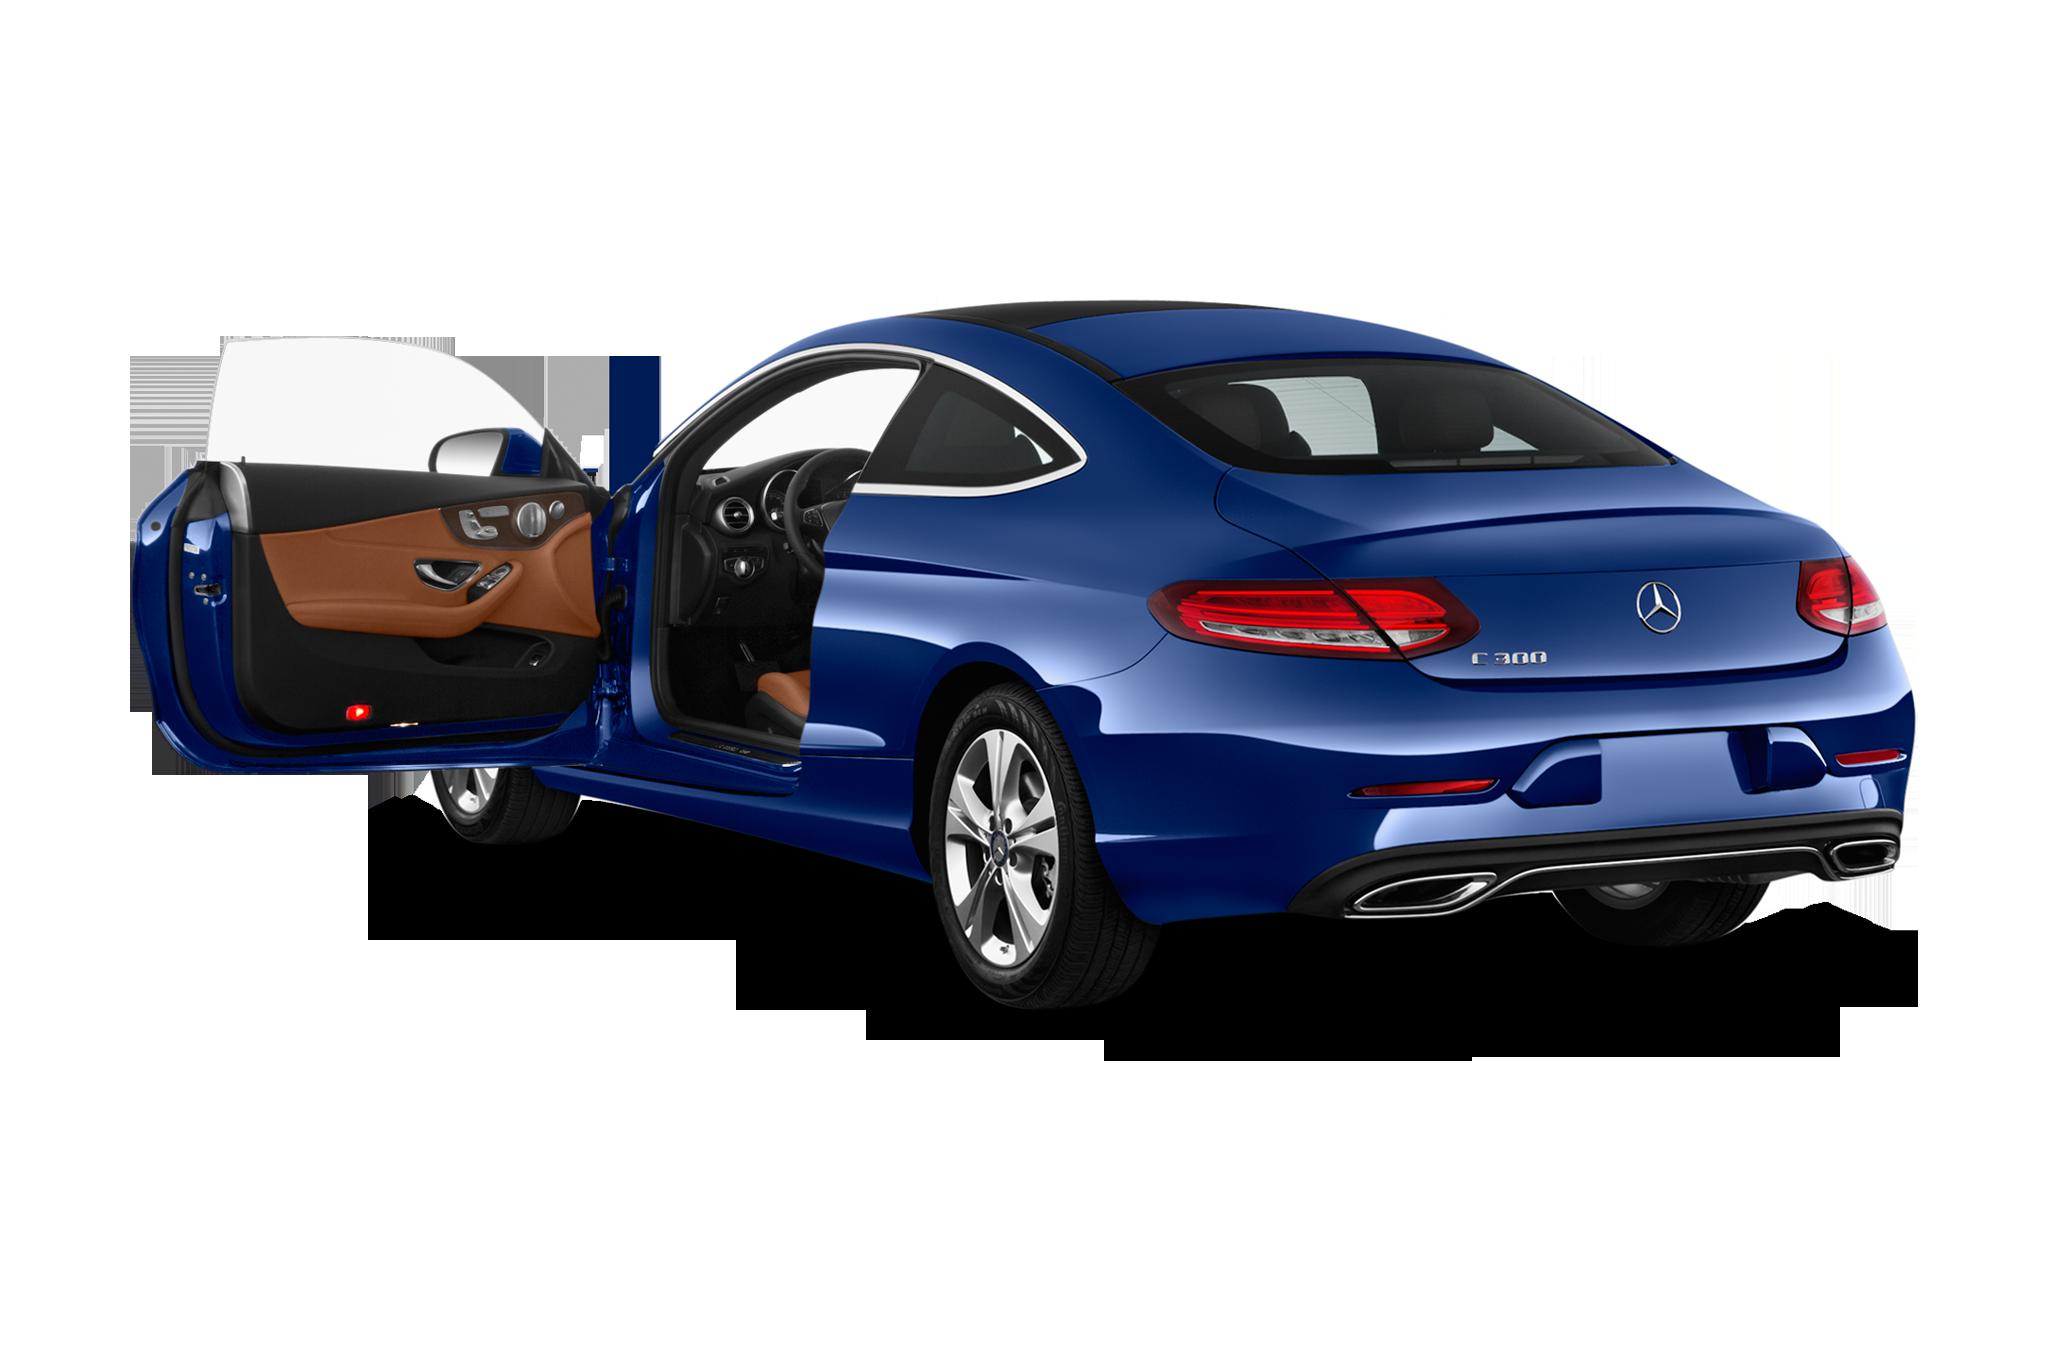 2018 mercedes benz c class spied with tweaks automobile magazine. Black Bedroom Furniture Sets. Home Design Ideas